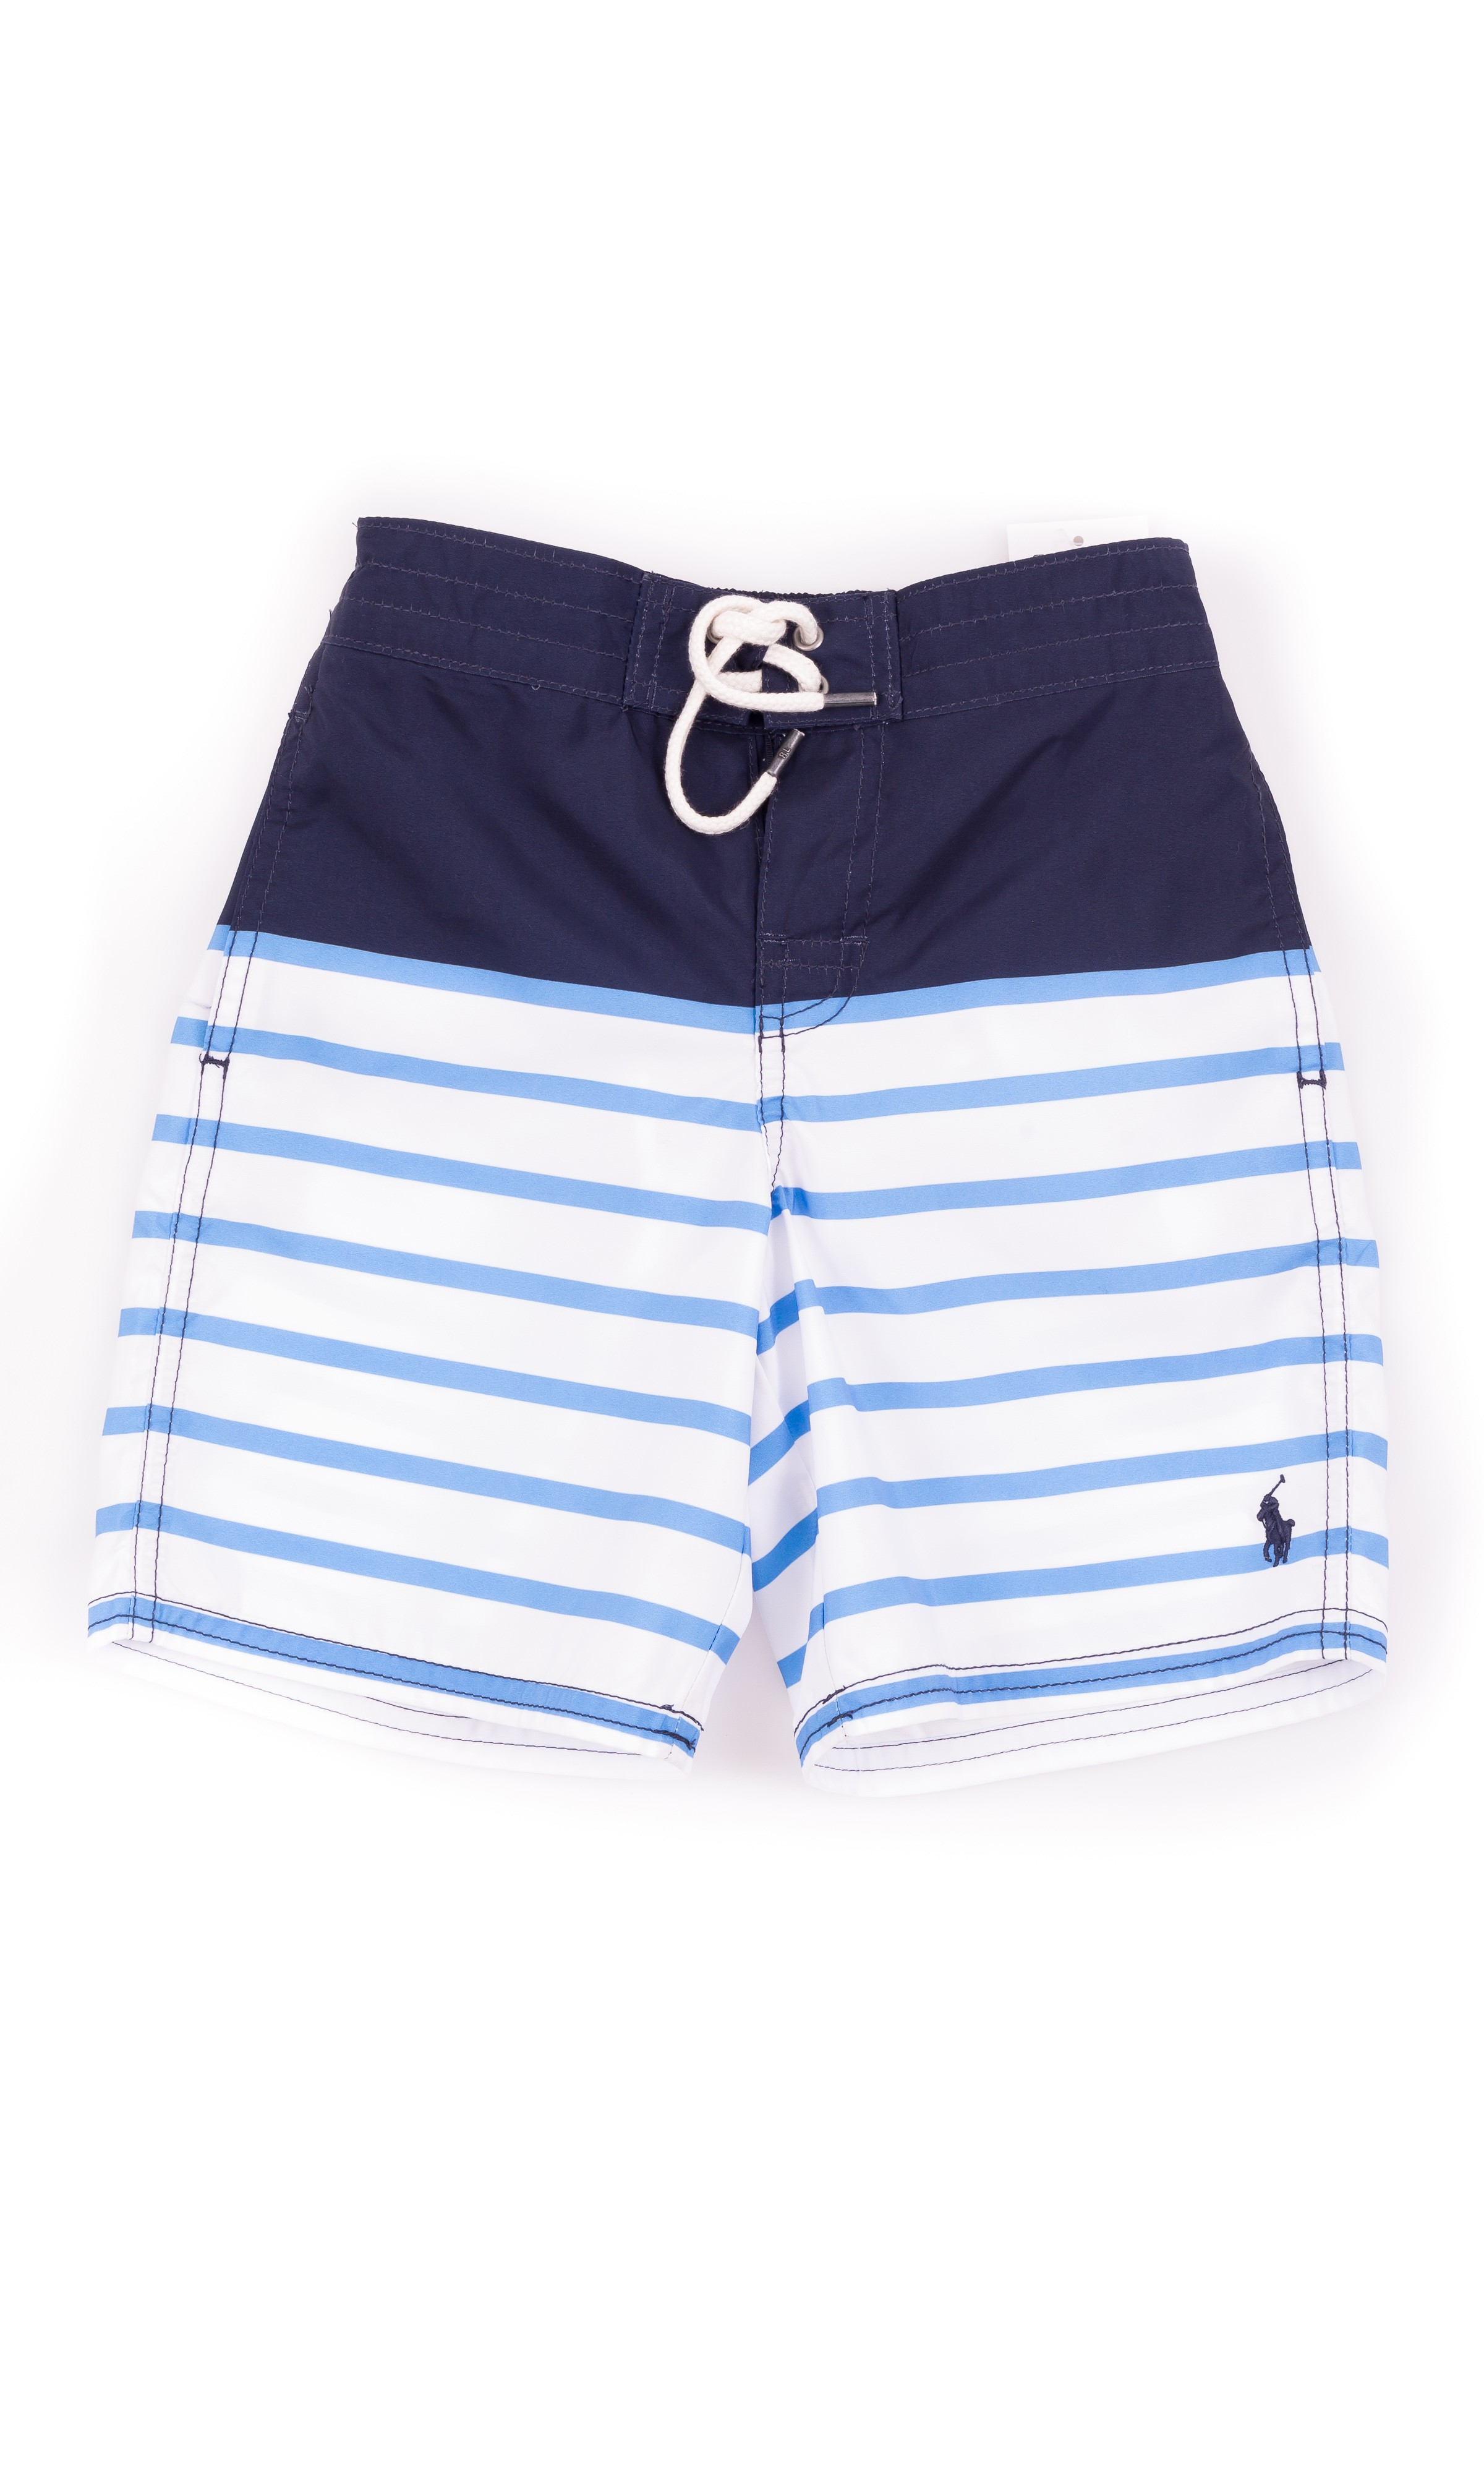 5a03e Lauren Where Ralph Eeca1 Buy Shorts Swim To Childrens wX0kP8nO